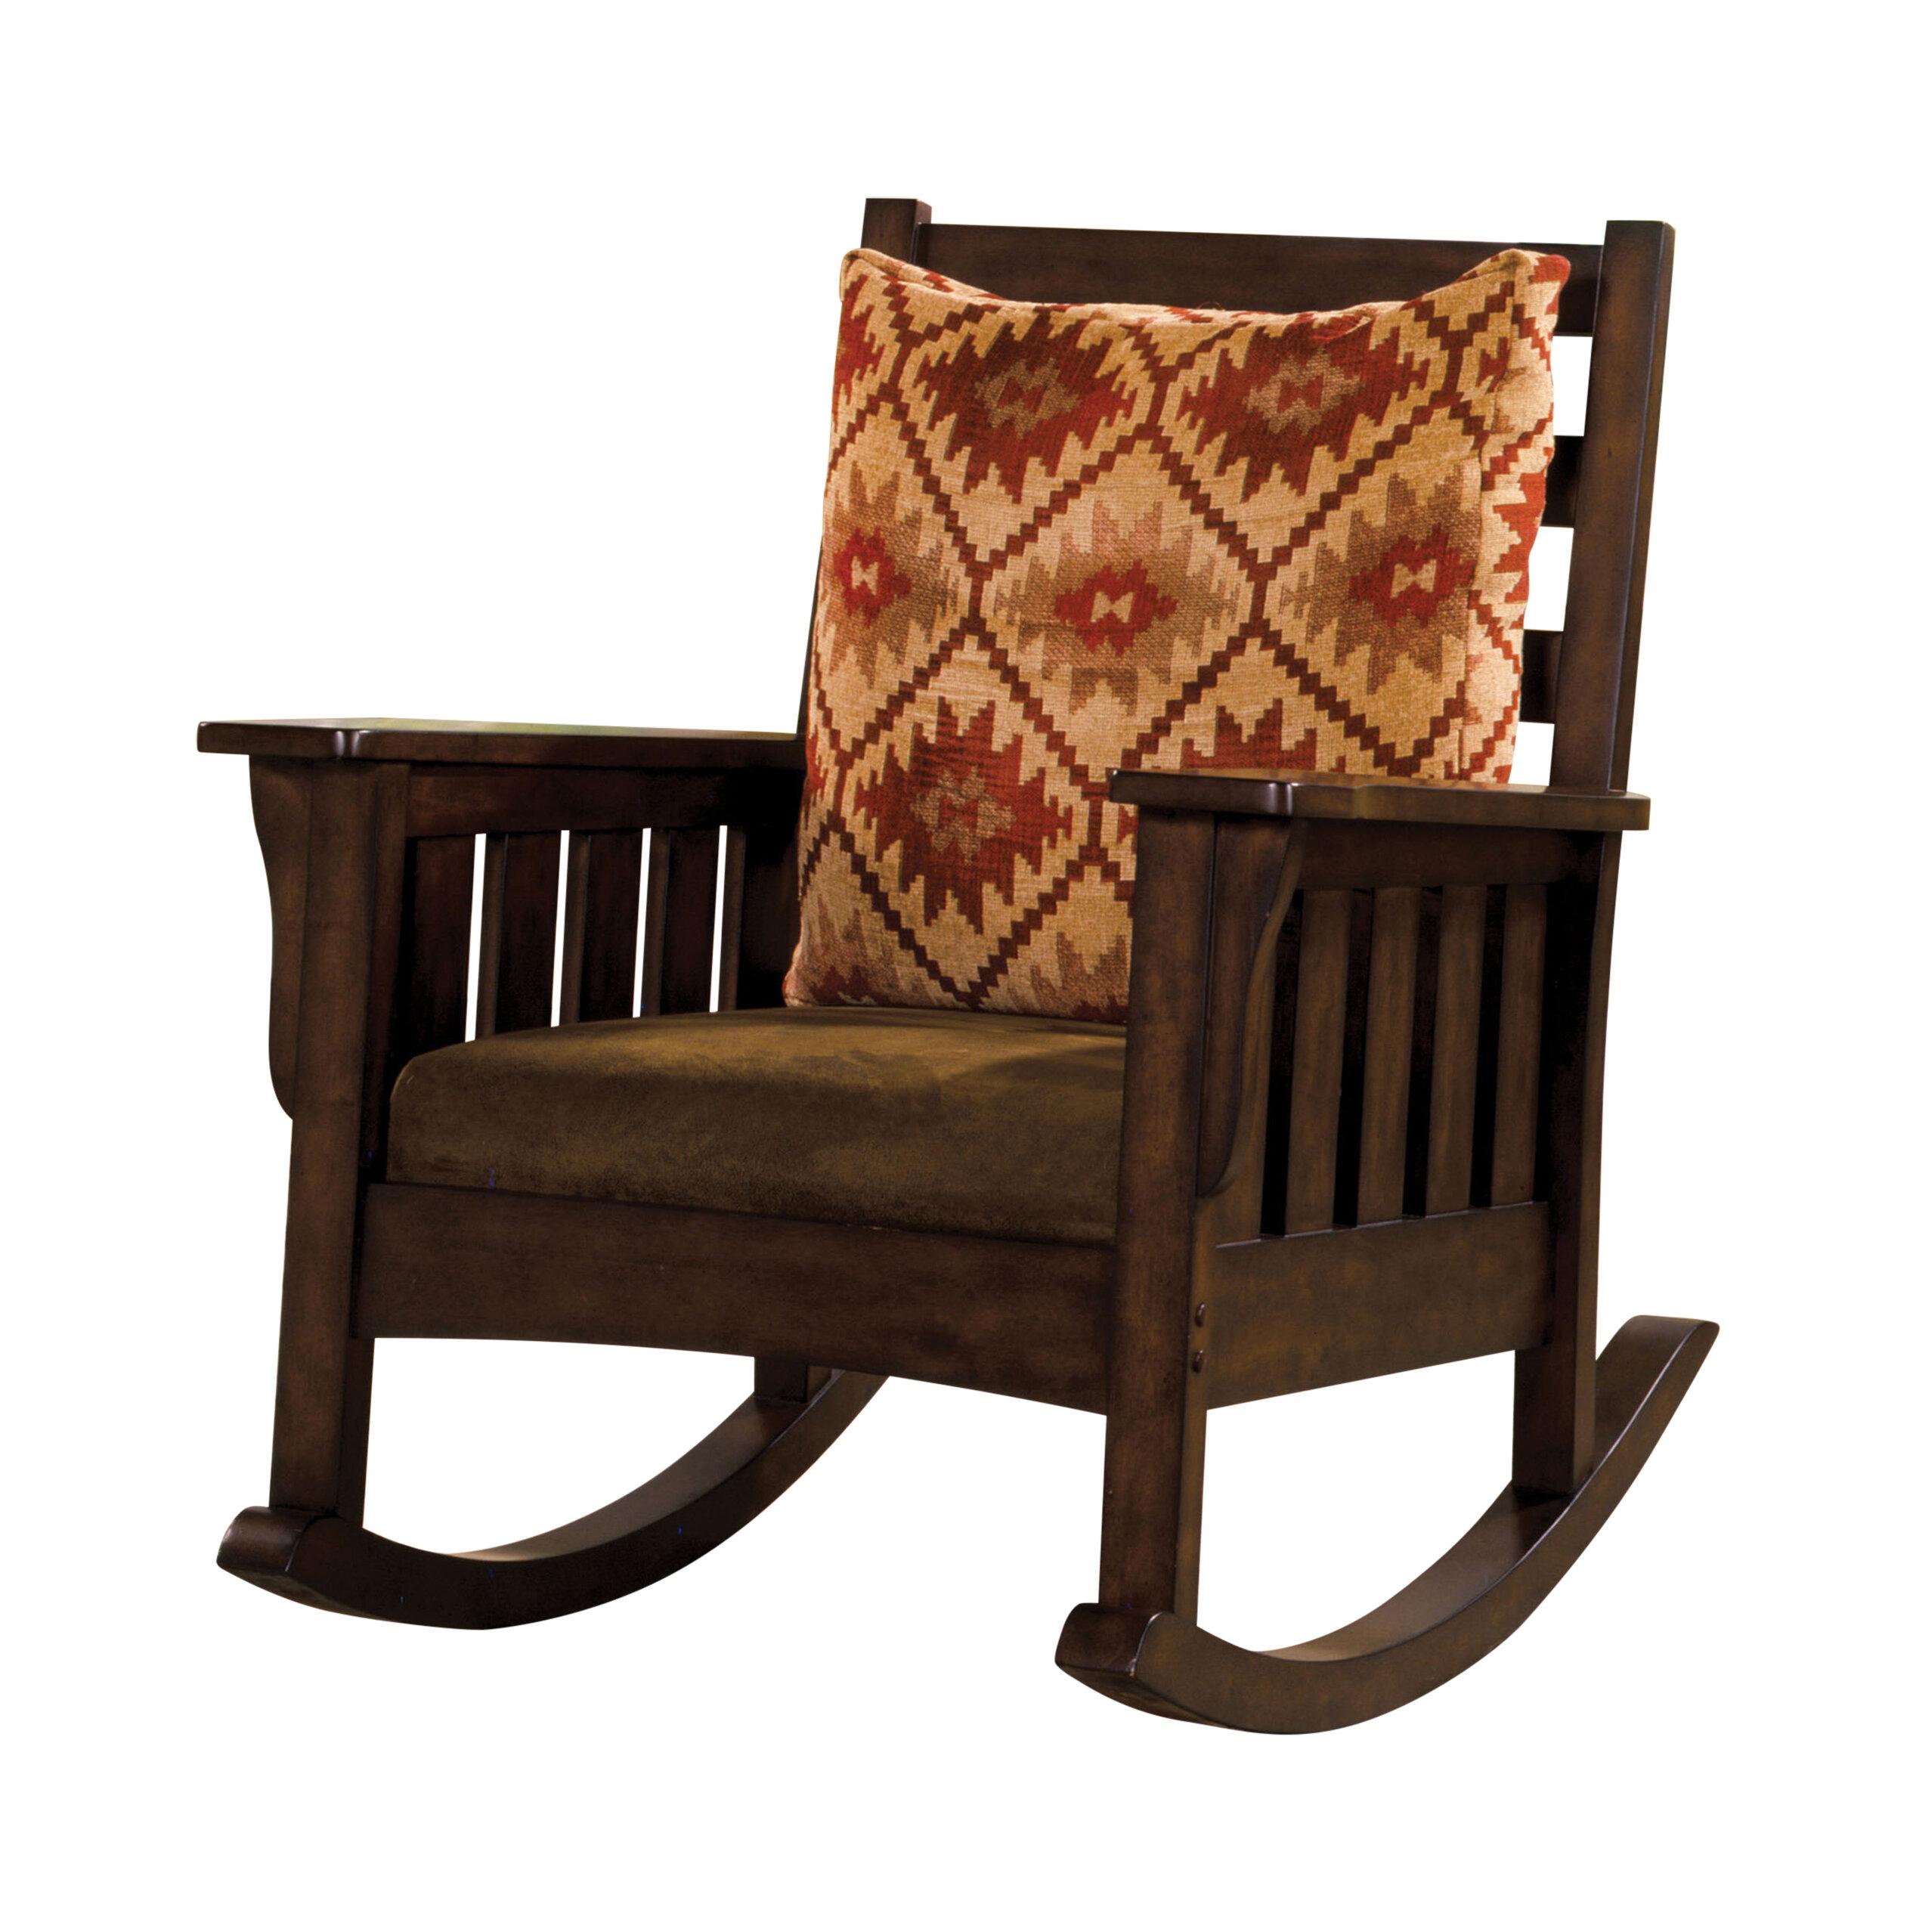 Hokku Designs Maxie Rocking Chair & Reviews | Wayfair (View 7 of 20)